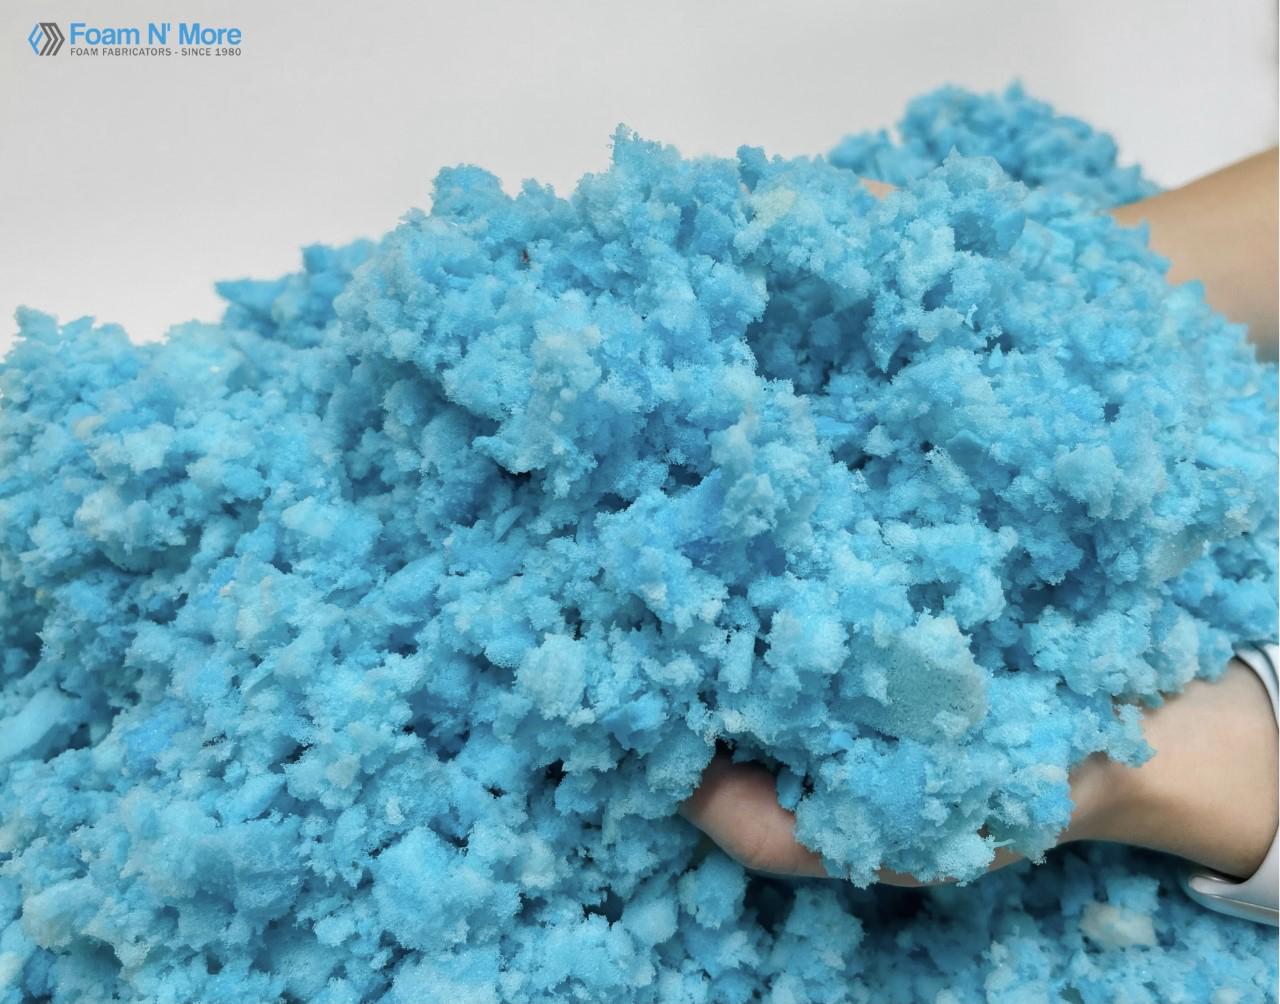 Picture of Shredded Memory Foam